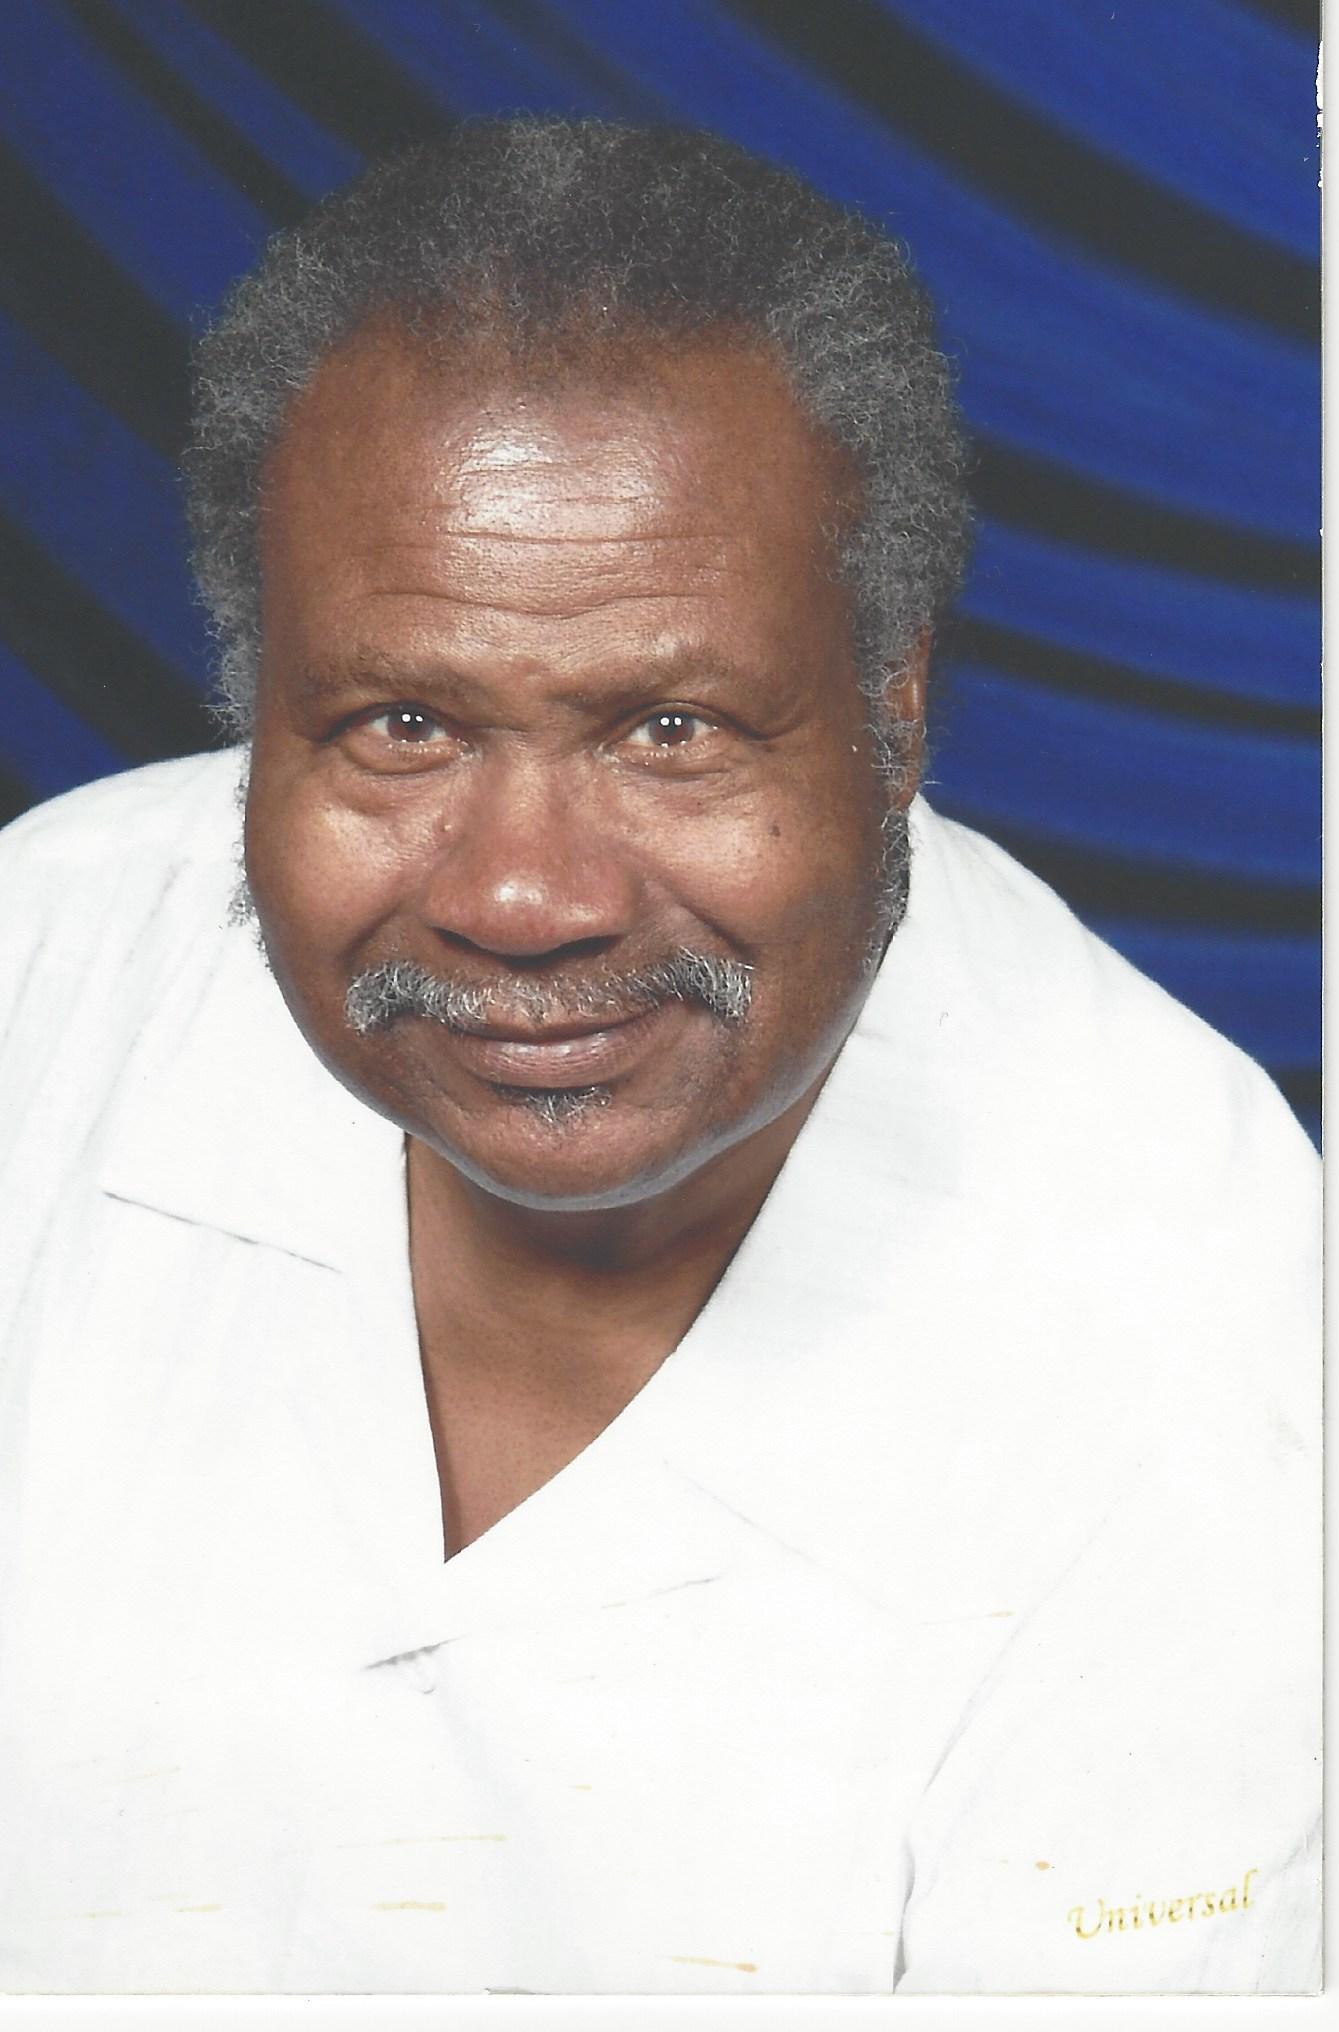 Mr. James F. Shannie